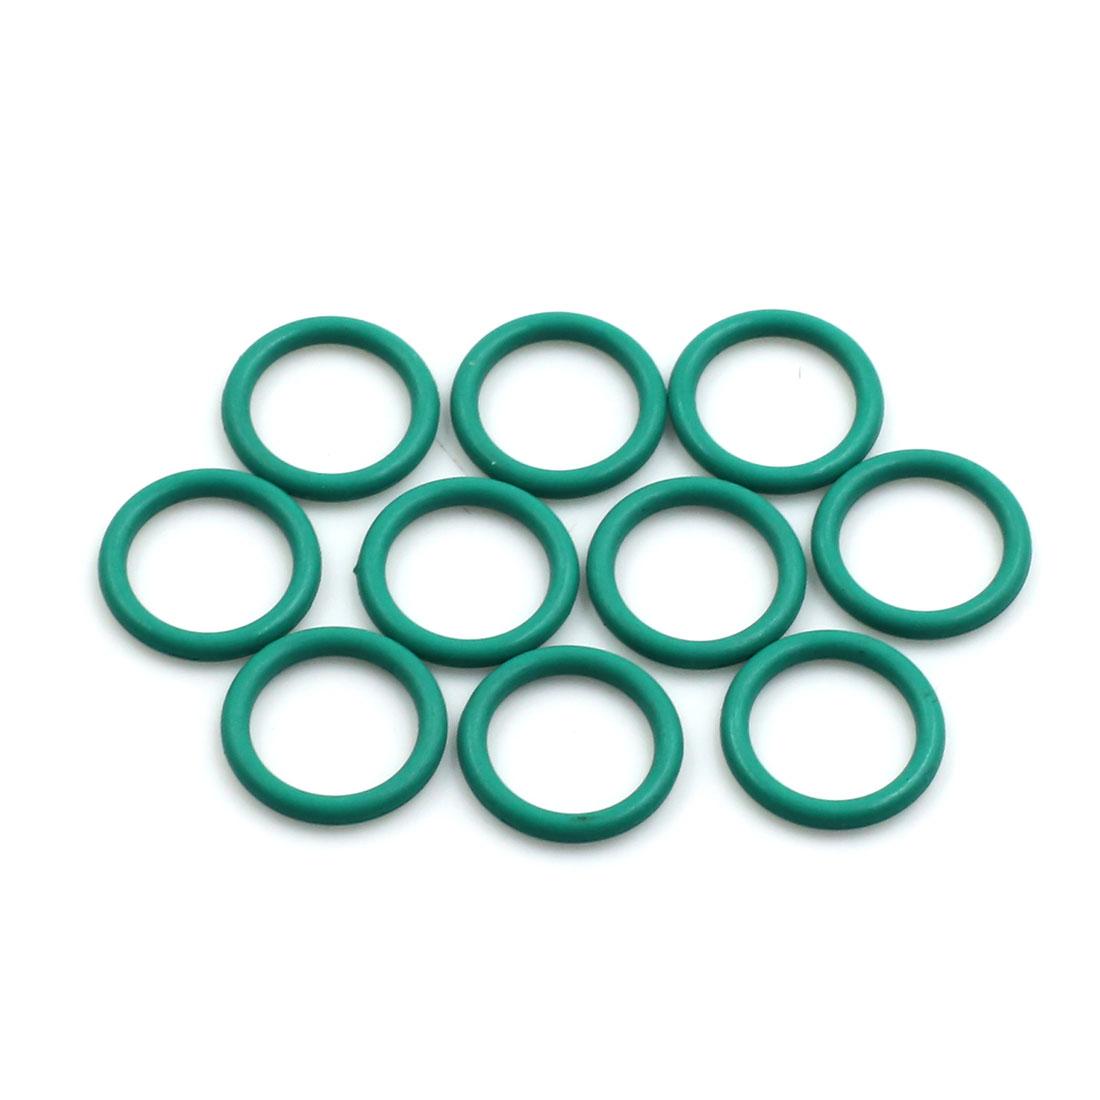 10pcs Green Universal FKM O-Ring Sealing Gasket Washer for Car 15mm x 2mm